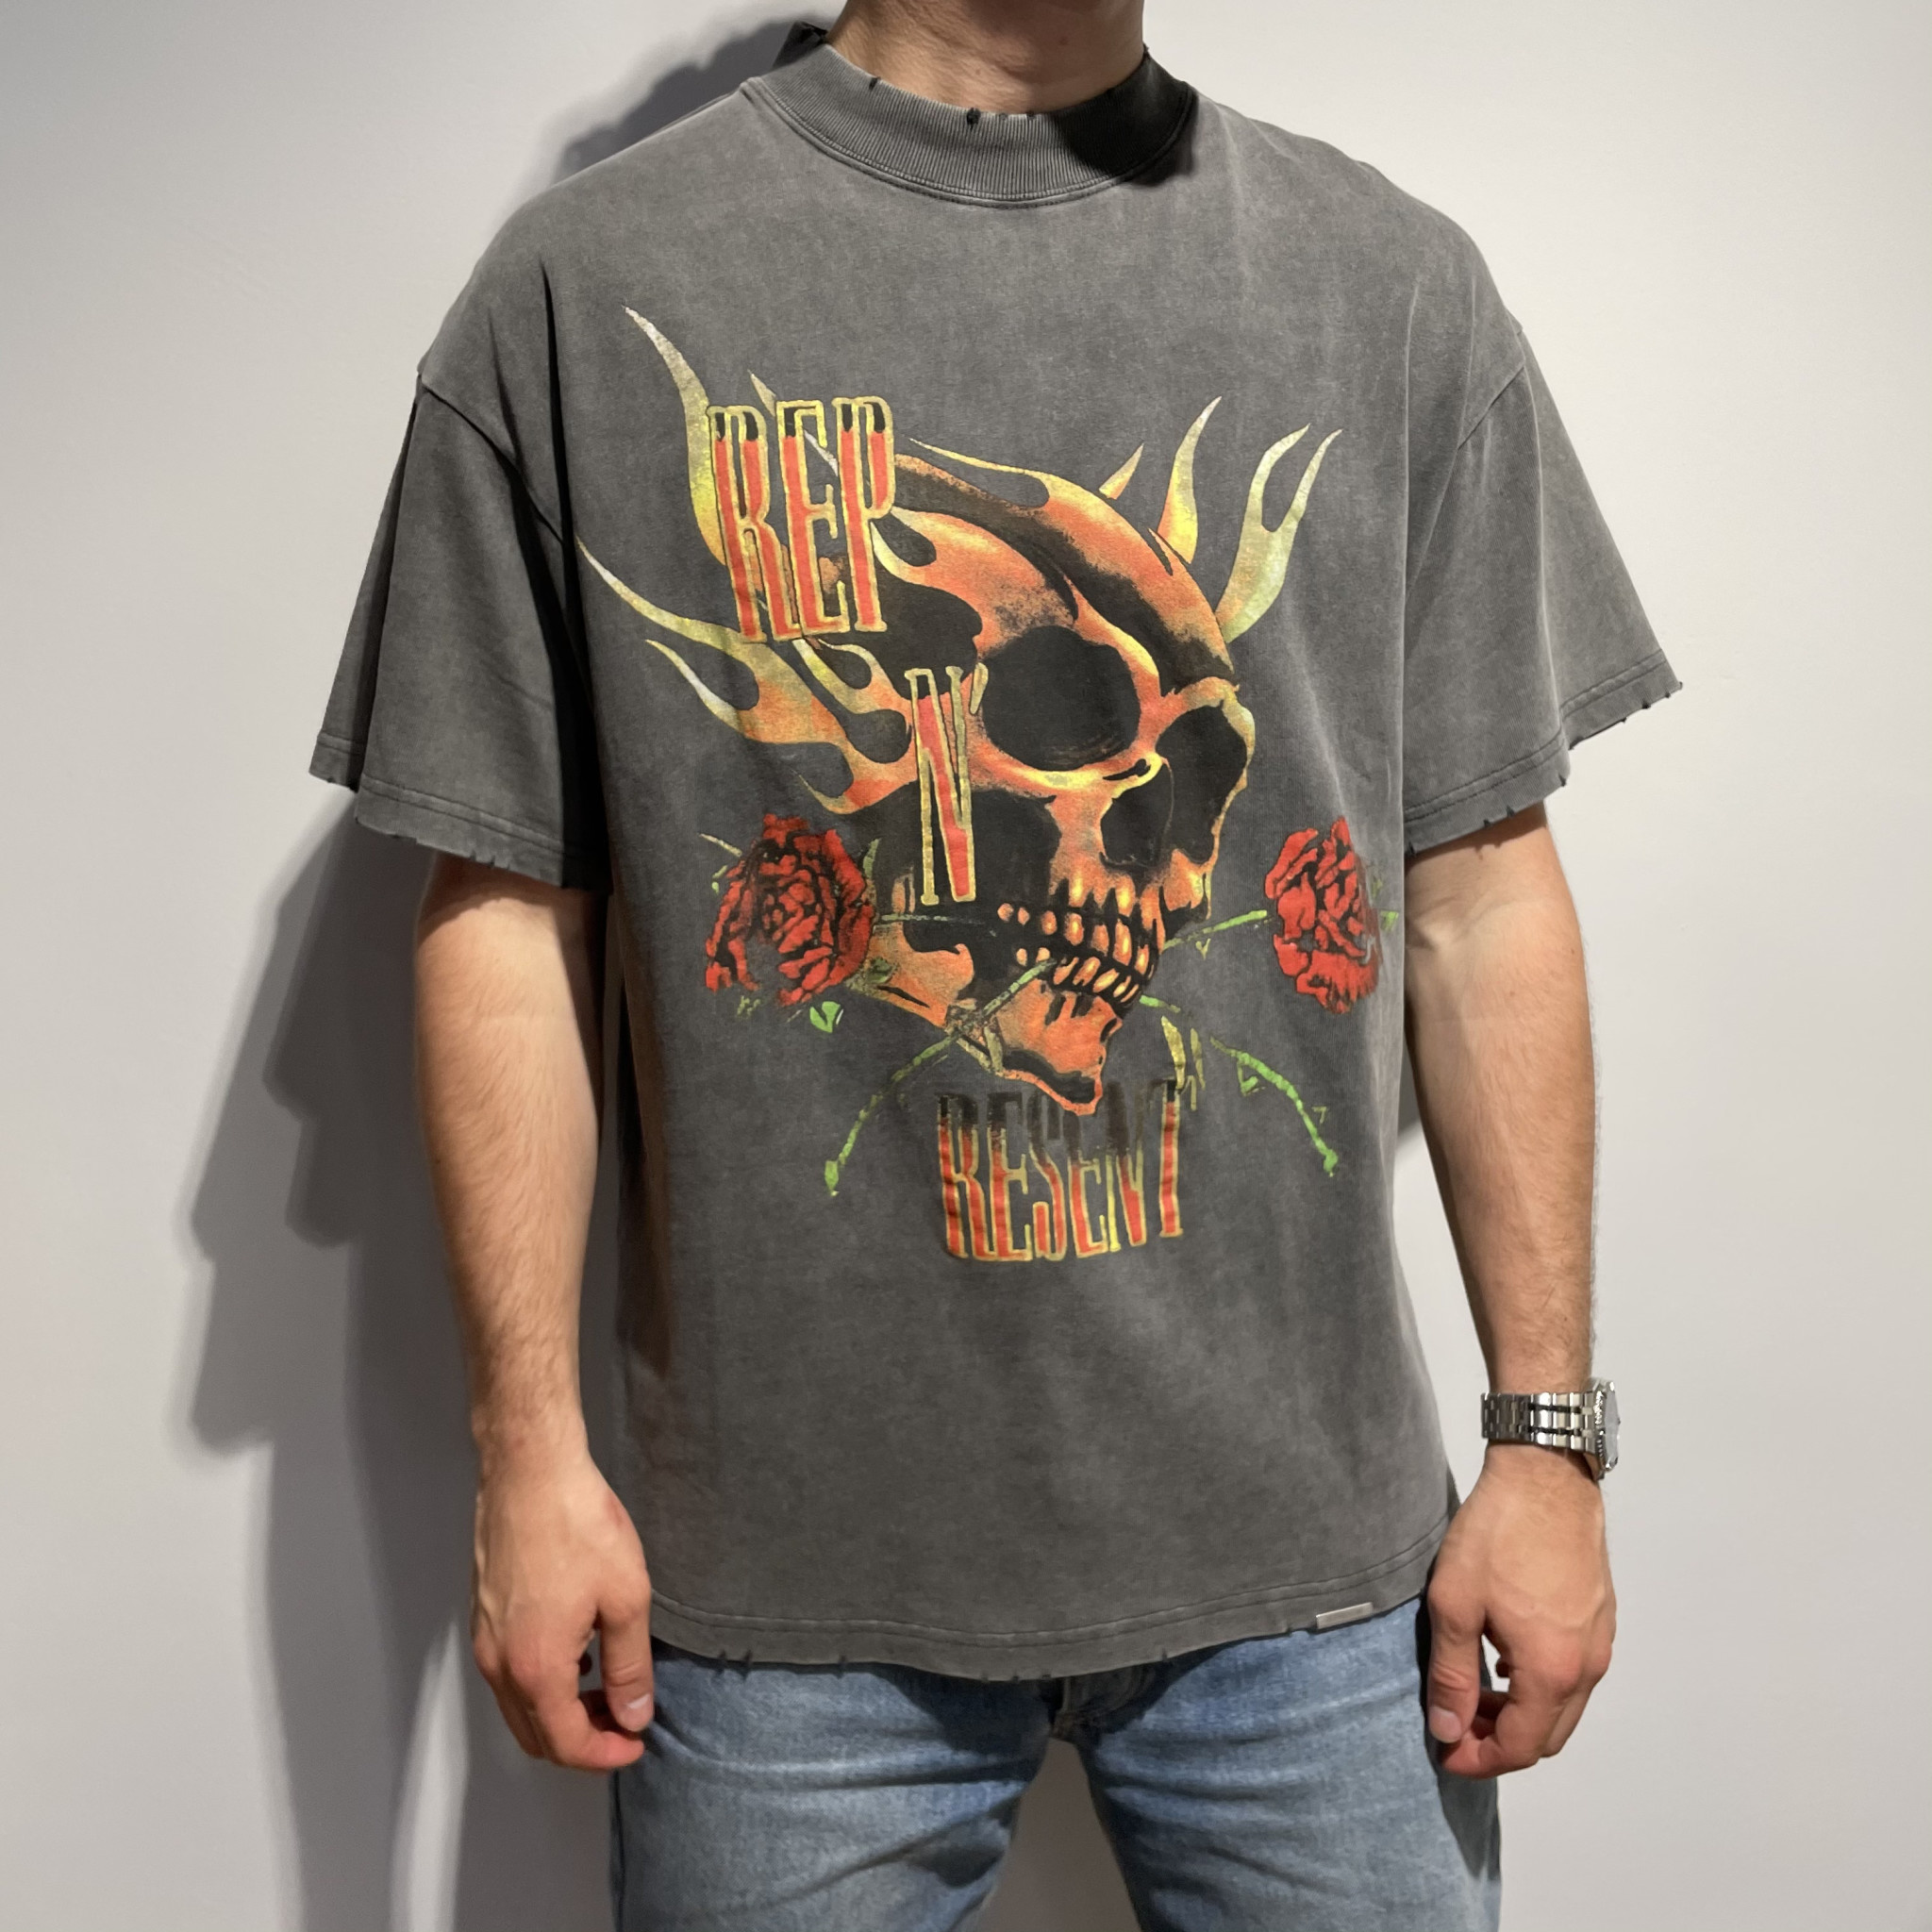 Rep n Resent T Shirt - Vintage Grey-1